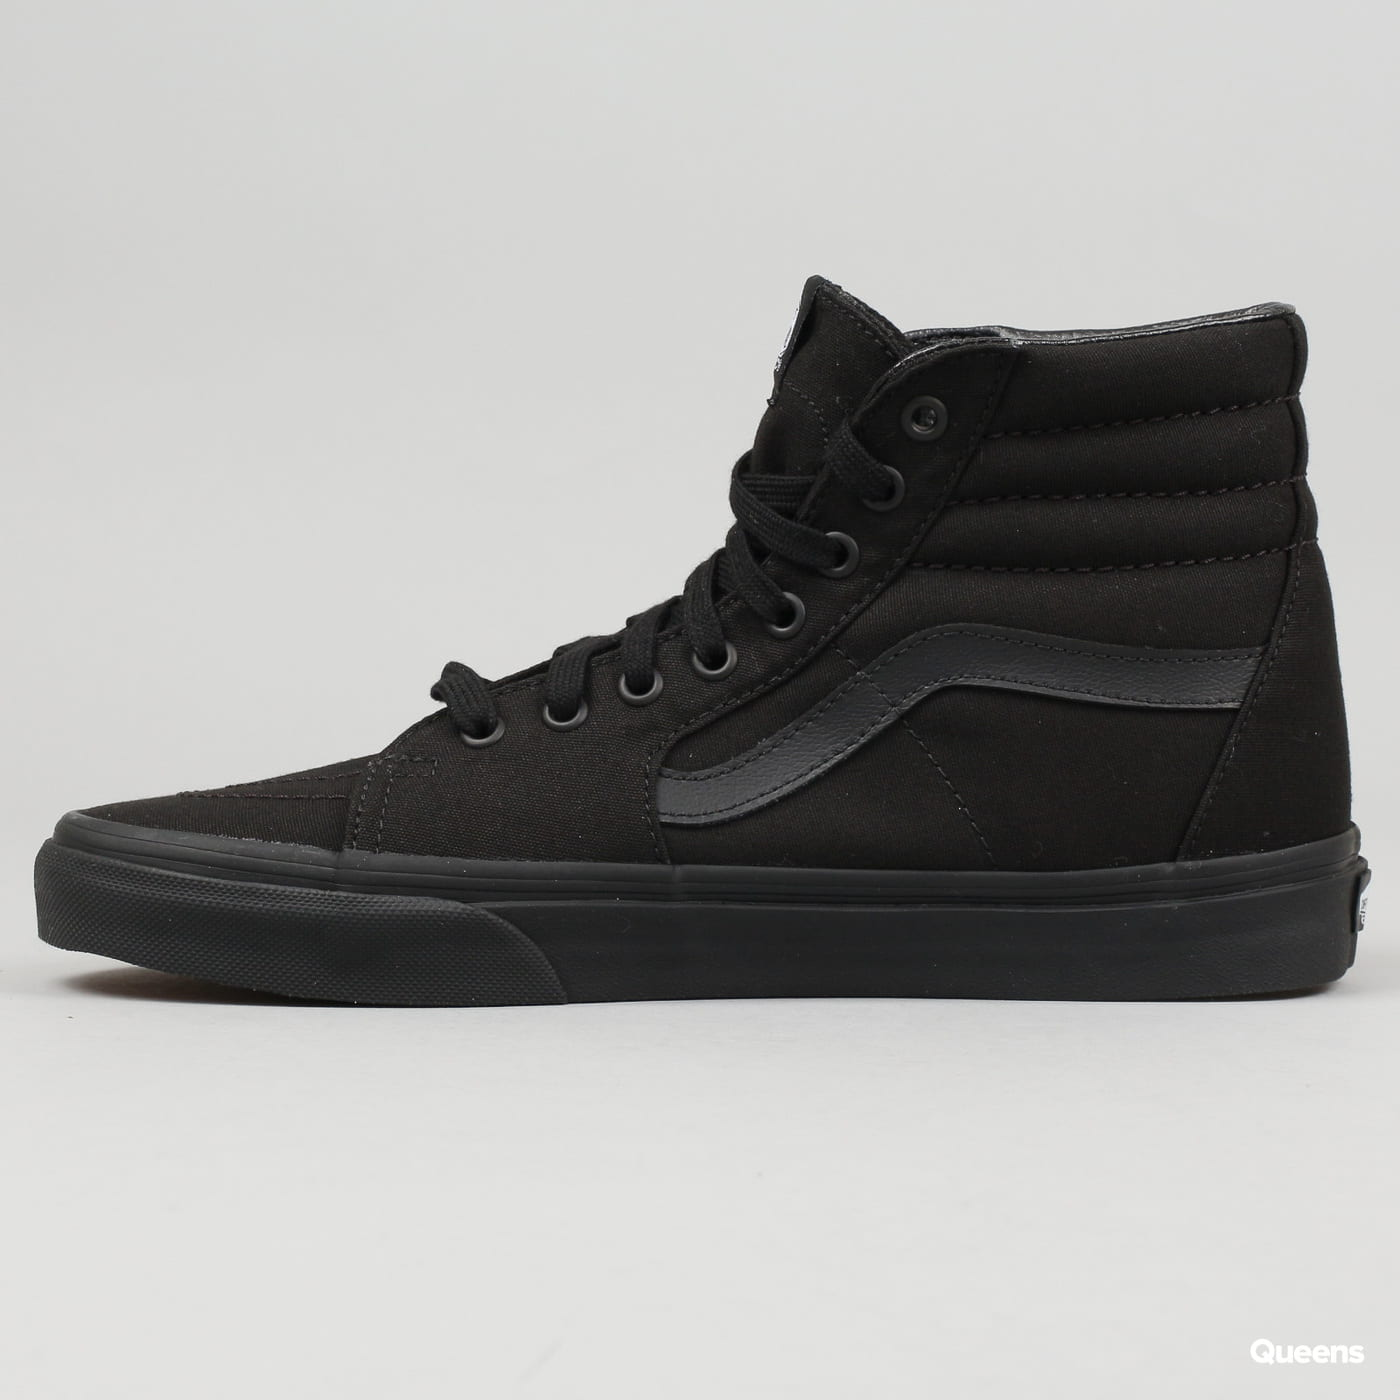 Vans SK8 - Hi black / black / black